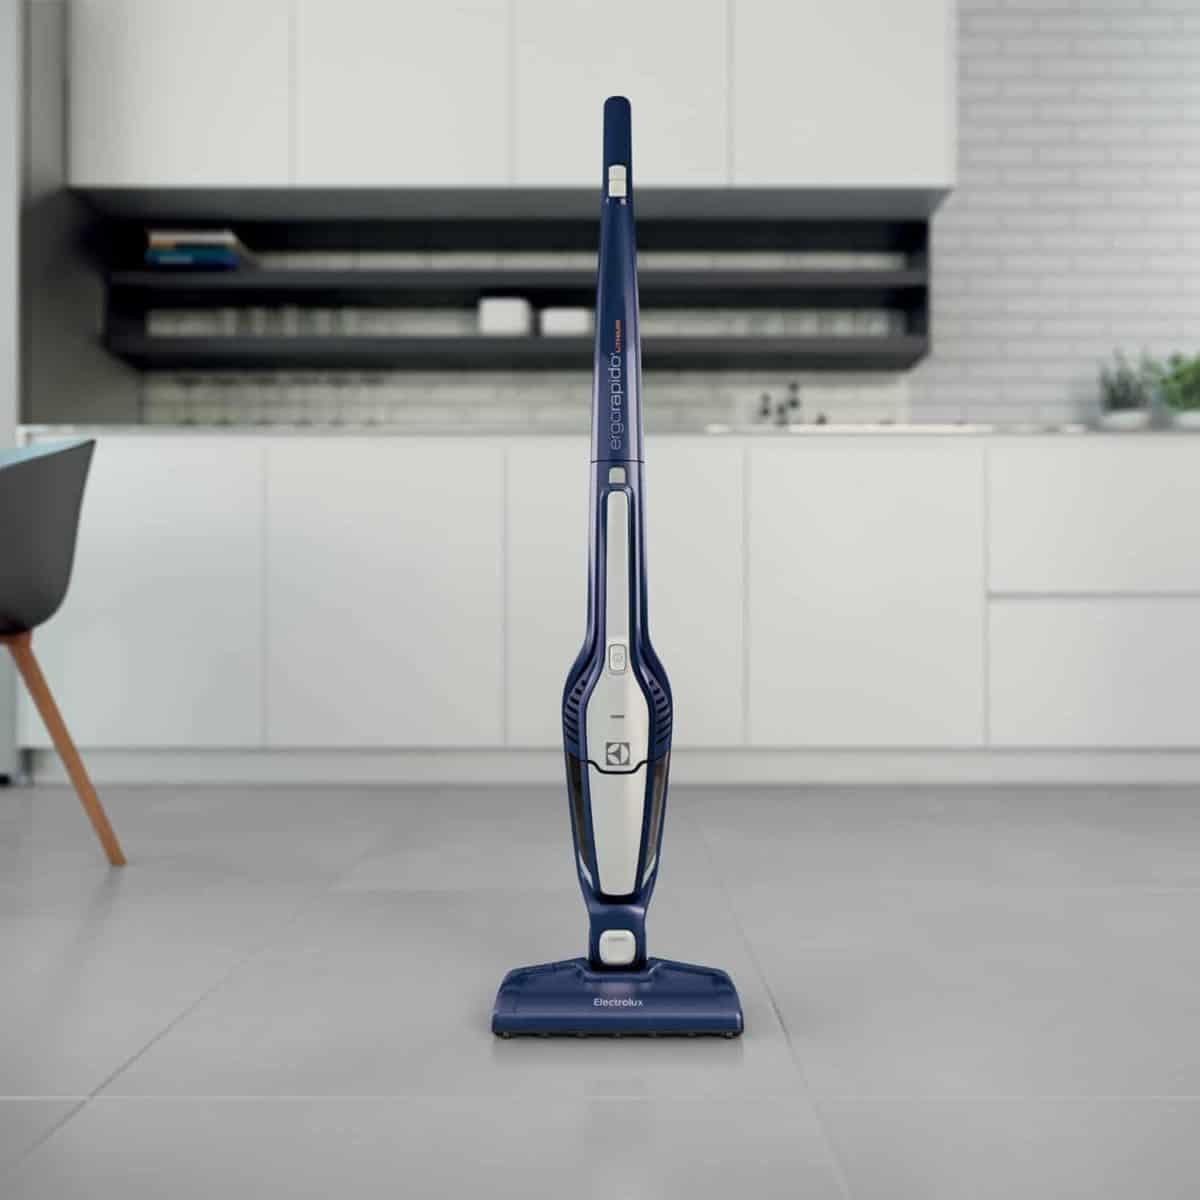 Best cordless stick vacuum for hardwood floors and pet for Wood floor vacuum cleaner